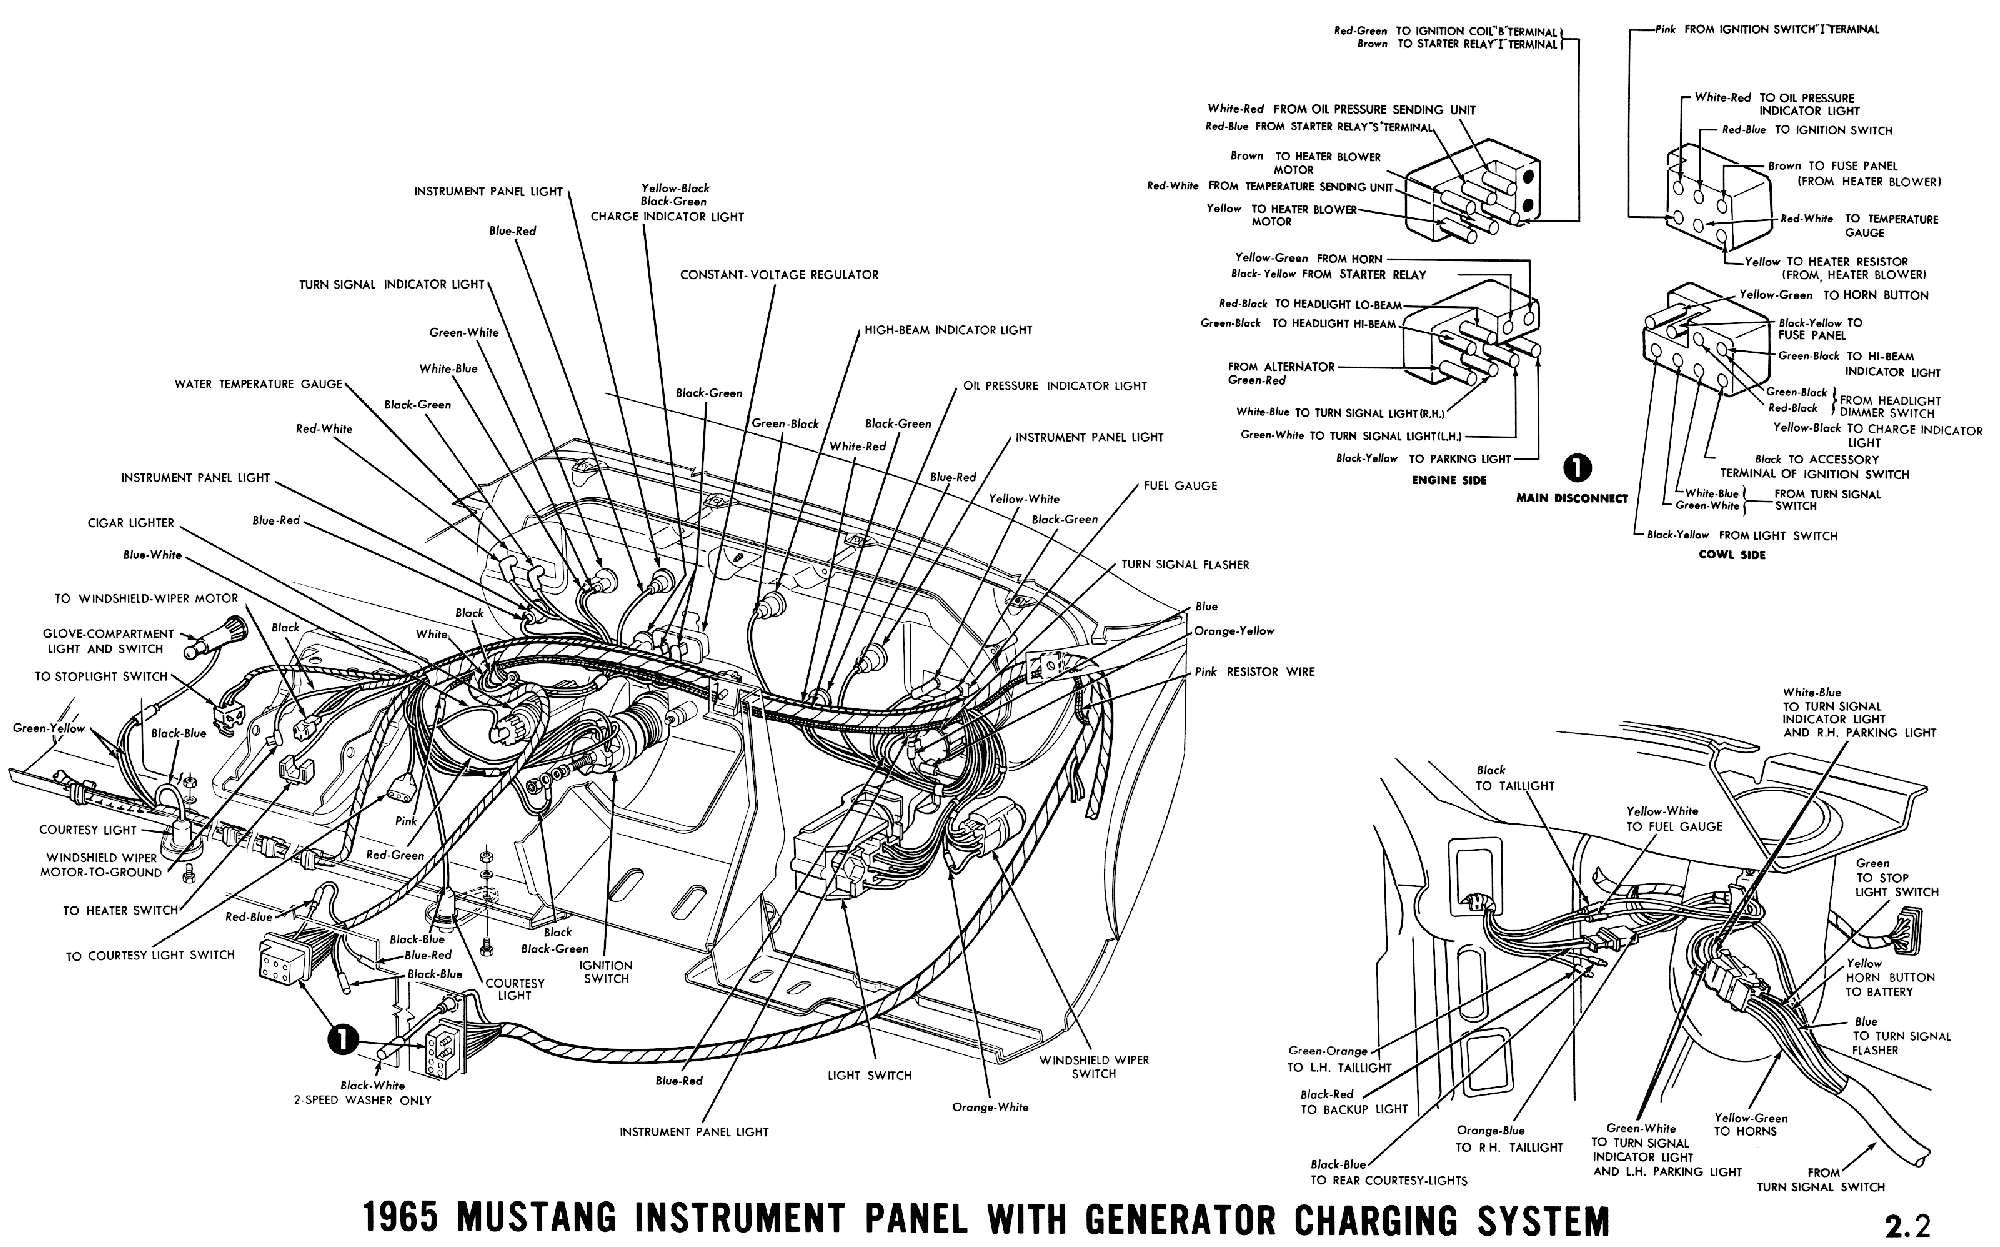 wiring diagram mustang diagrams average joe restoration splendi picture ideas free jpg